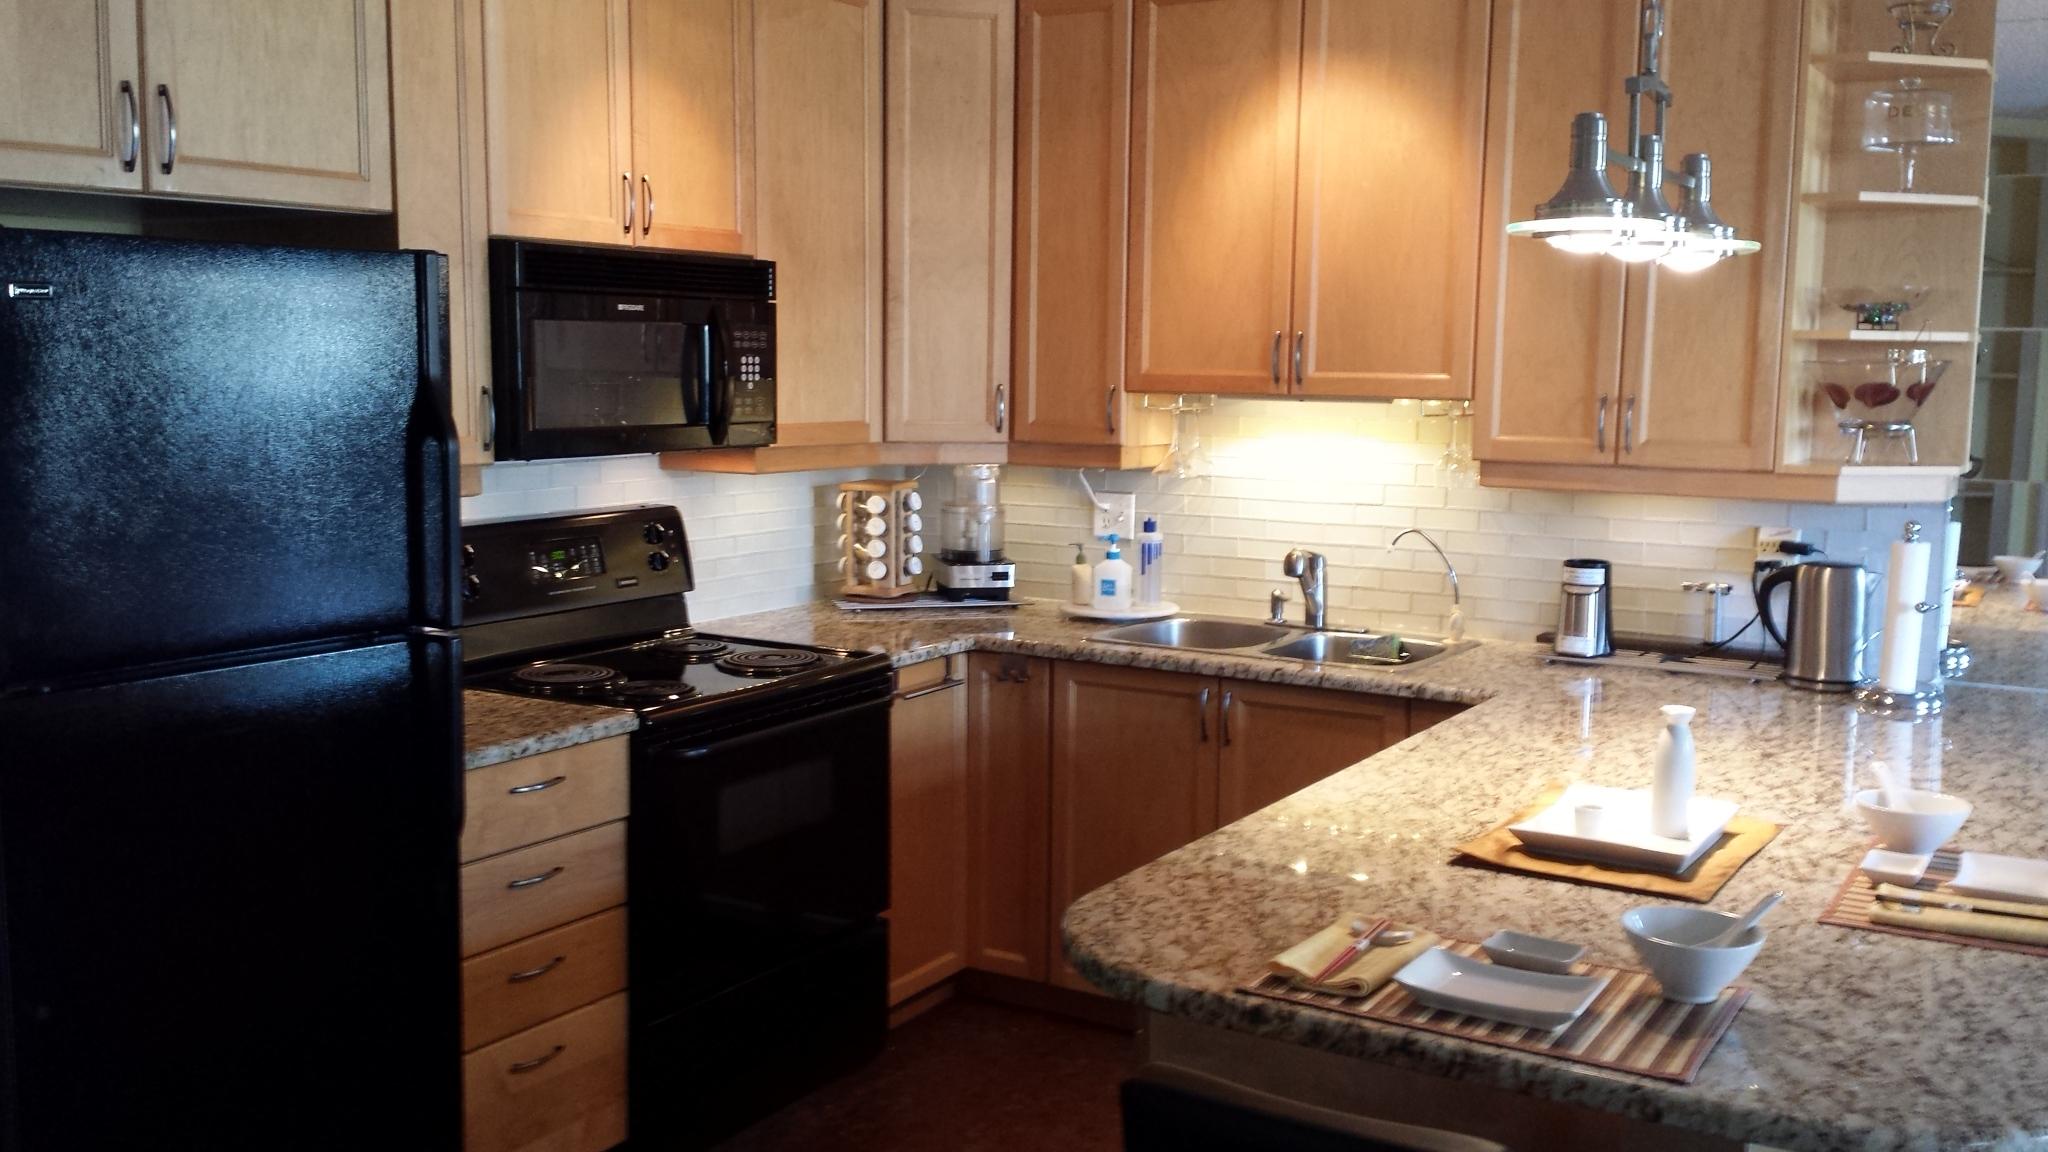 Unit 204 Kitchen 5